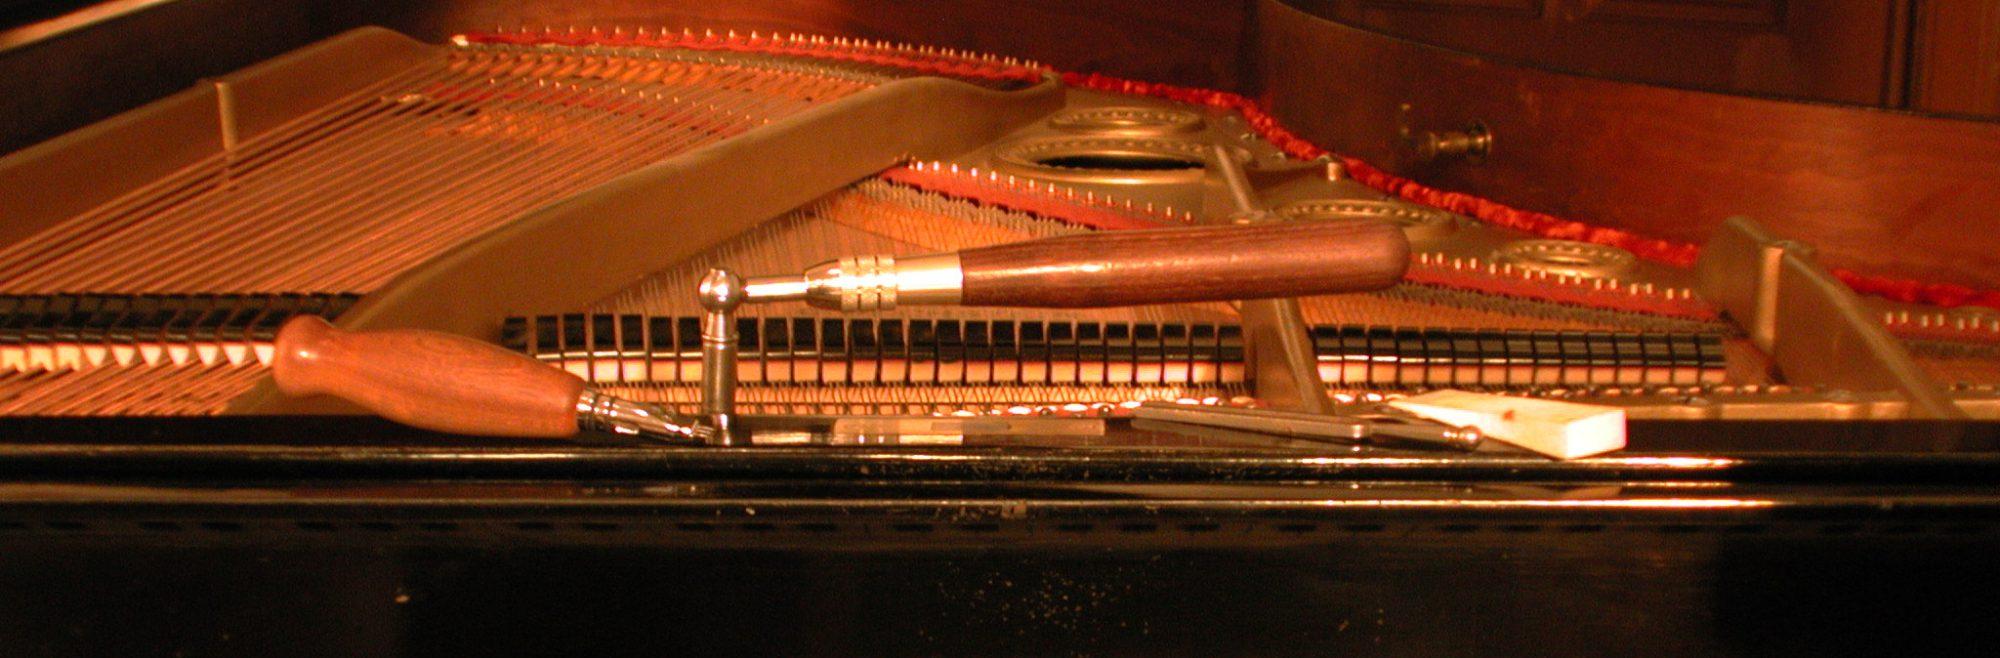 Klavierwerkstatt Marcellus Jany